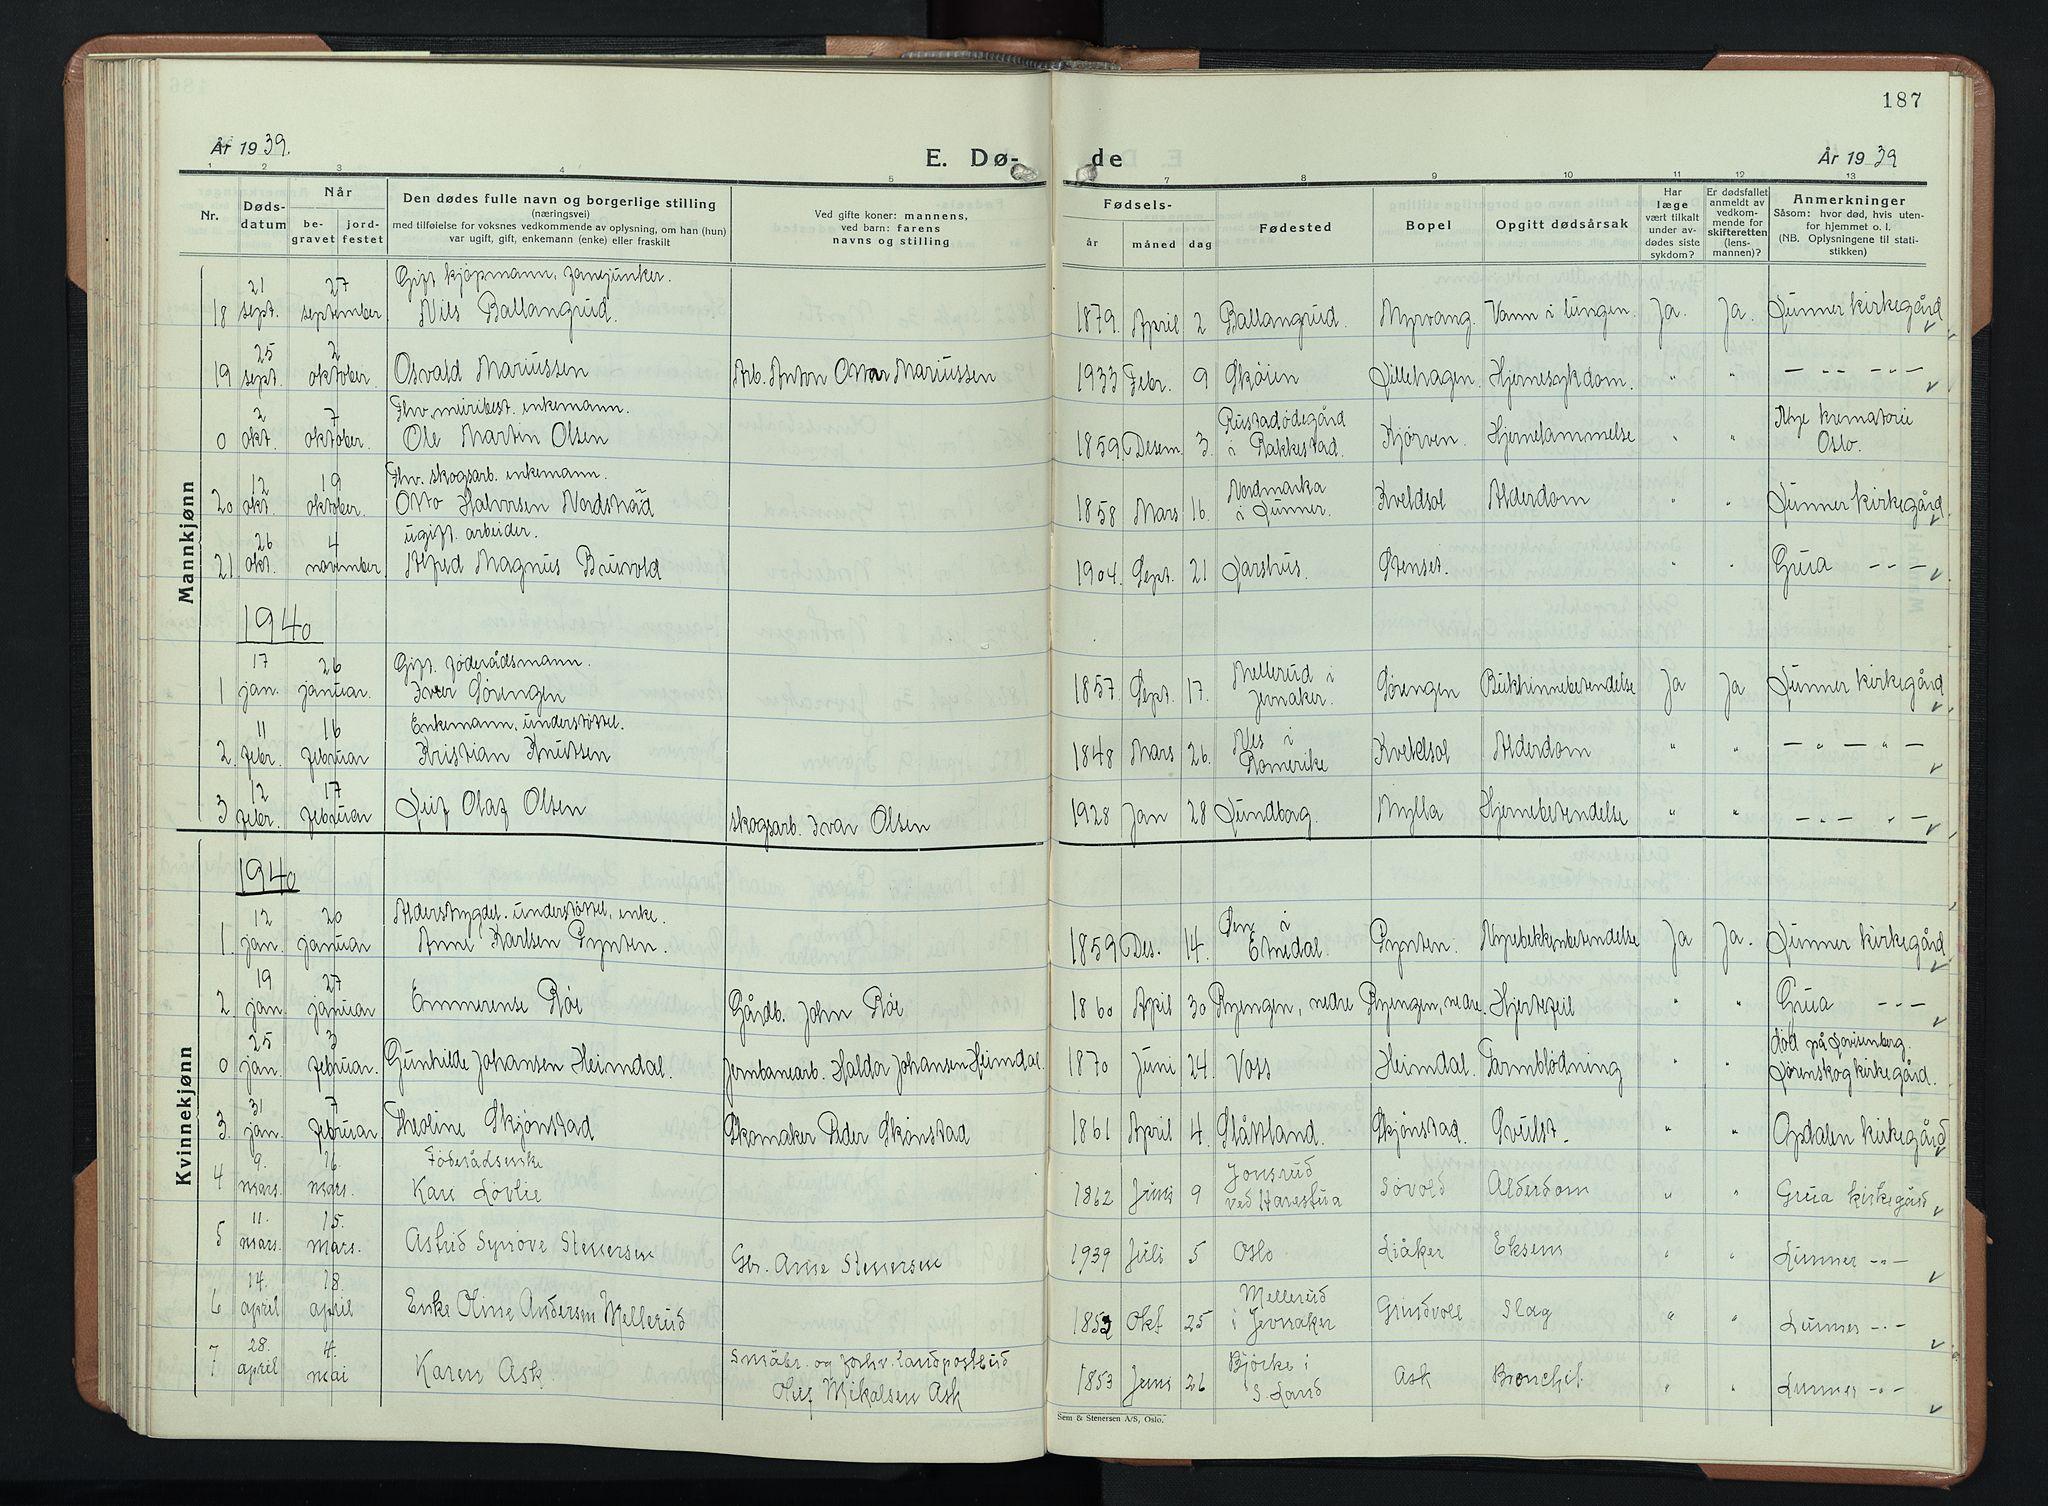 SAH, Lunner prestekontor, H/Ha/Hab/L0003: Klokkerbok nr. 3, 1933-1945, s. 187